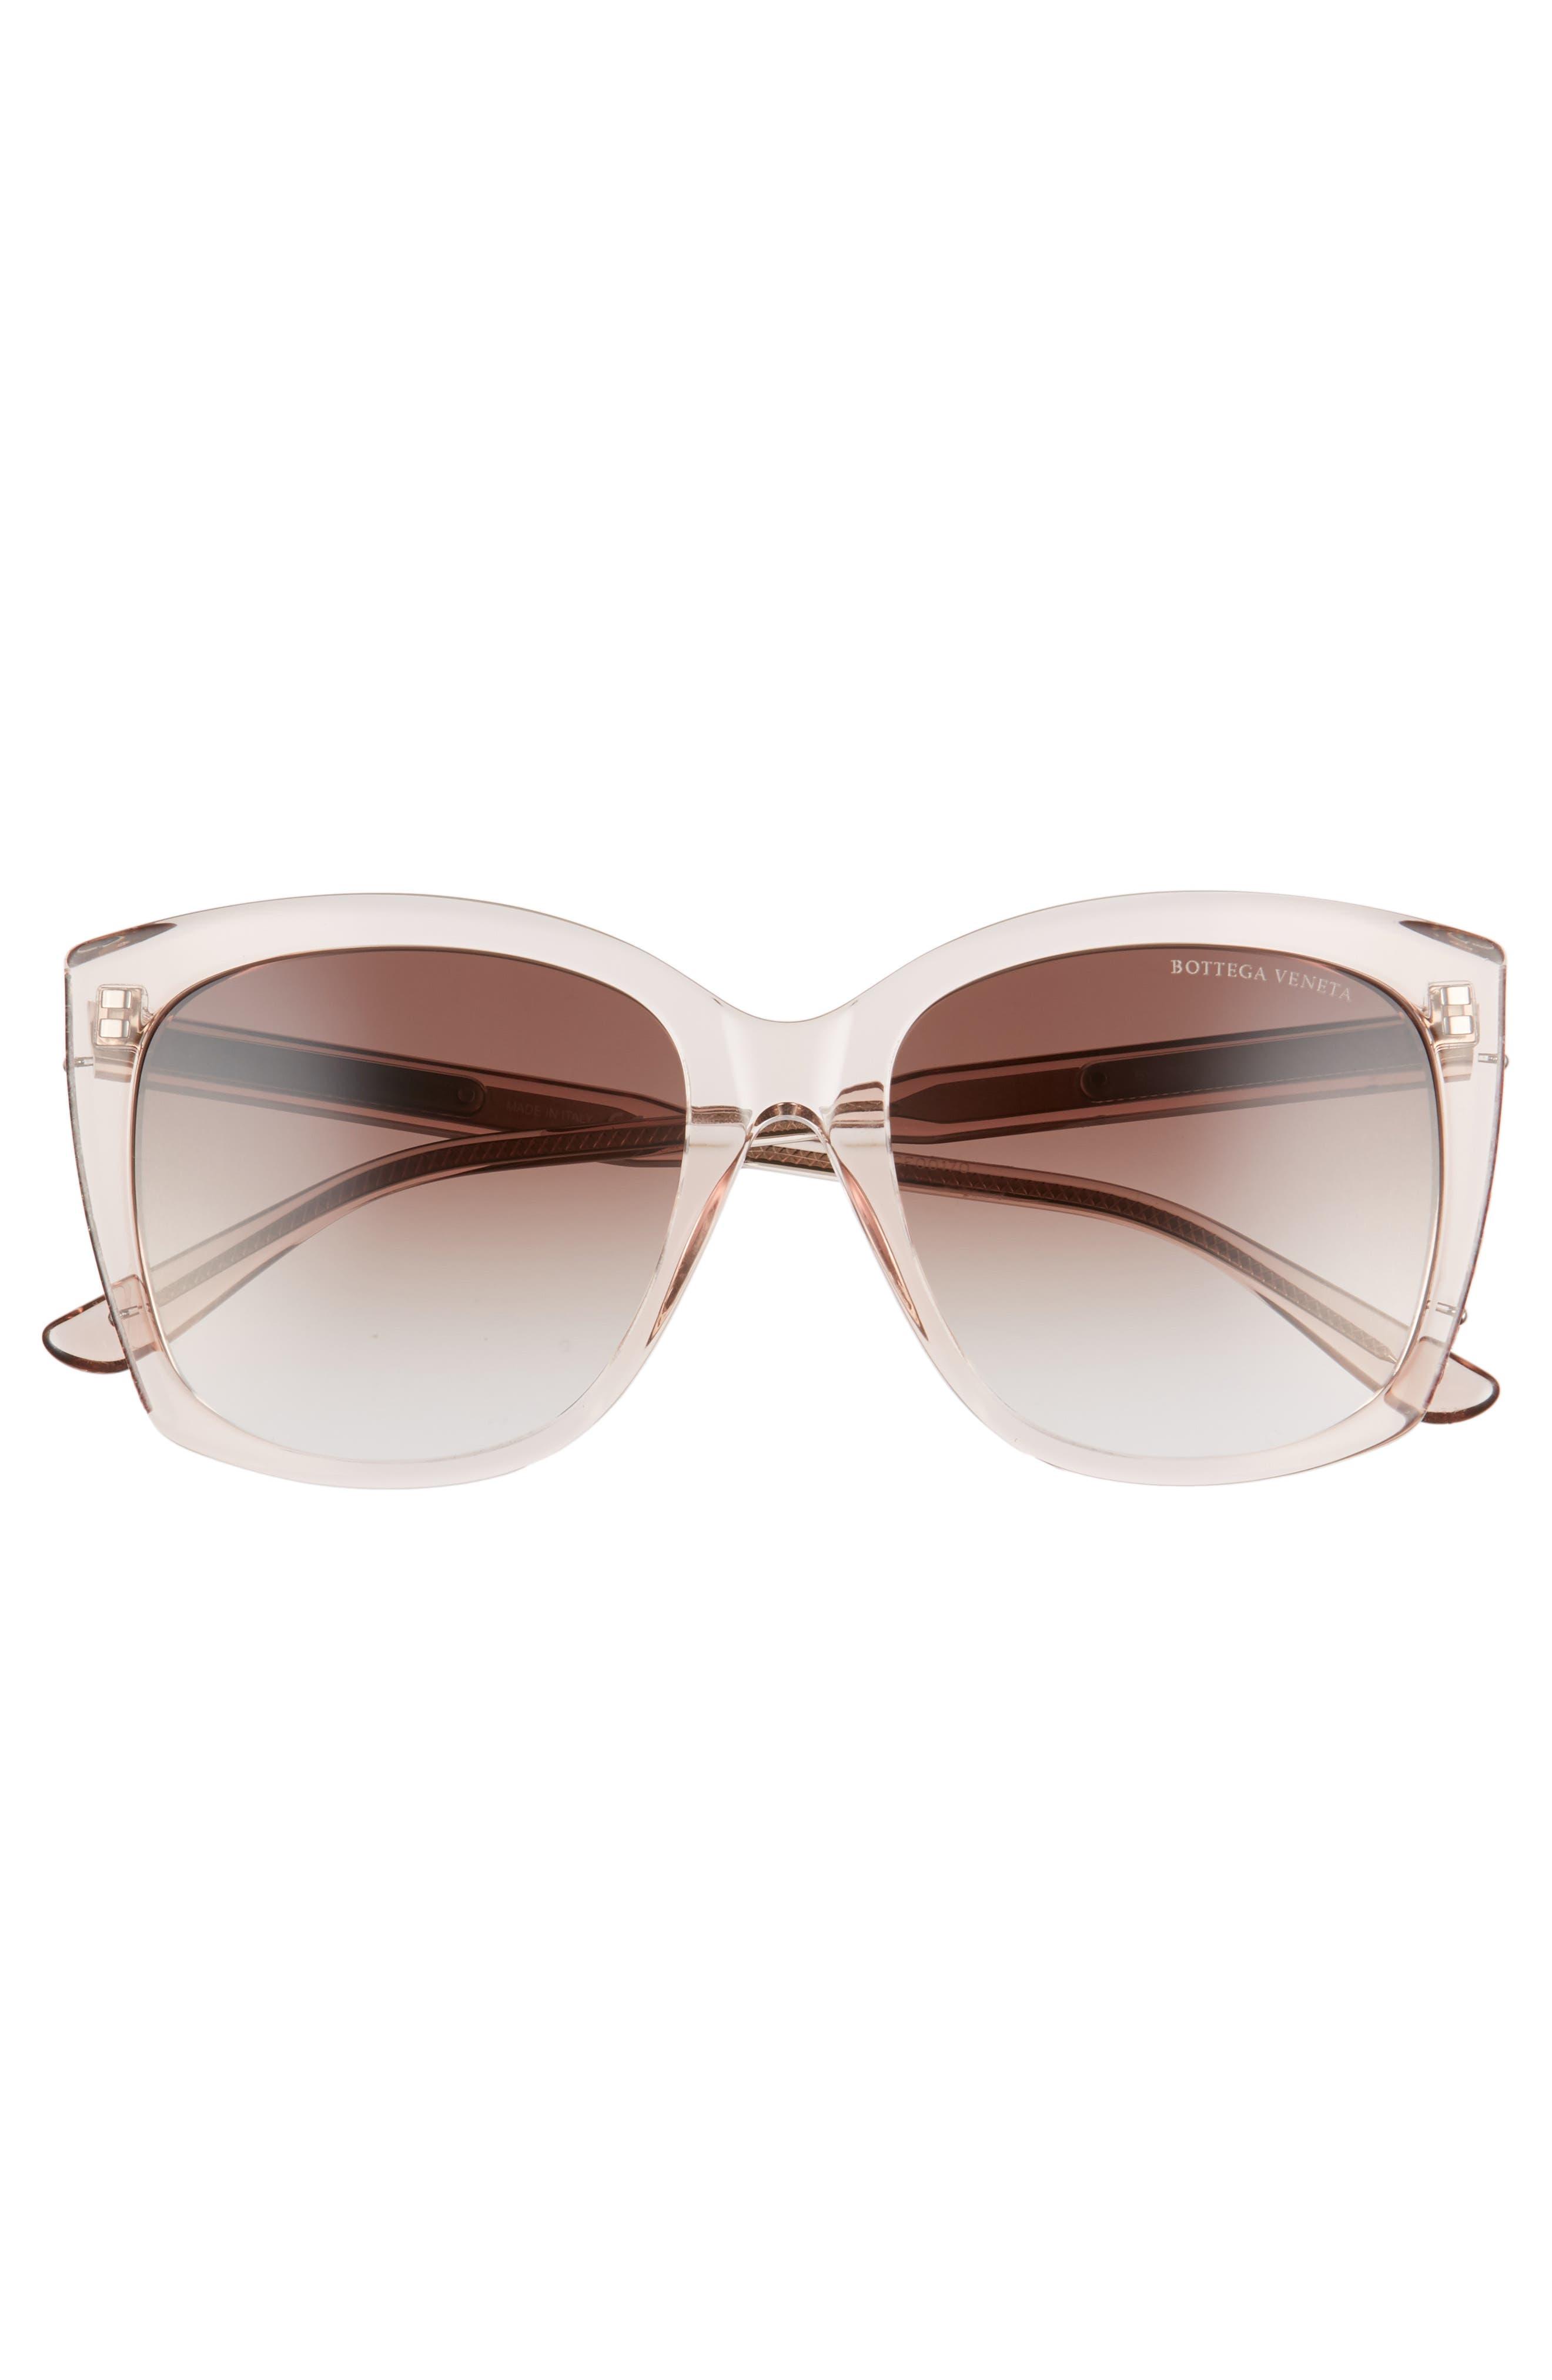 55mm Cat Eye Sunglasses,                             Alternate thumbnail 3, color,                             Pink